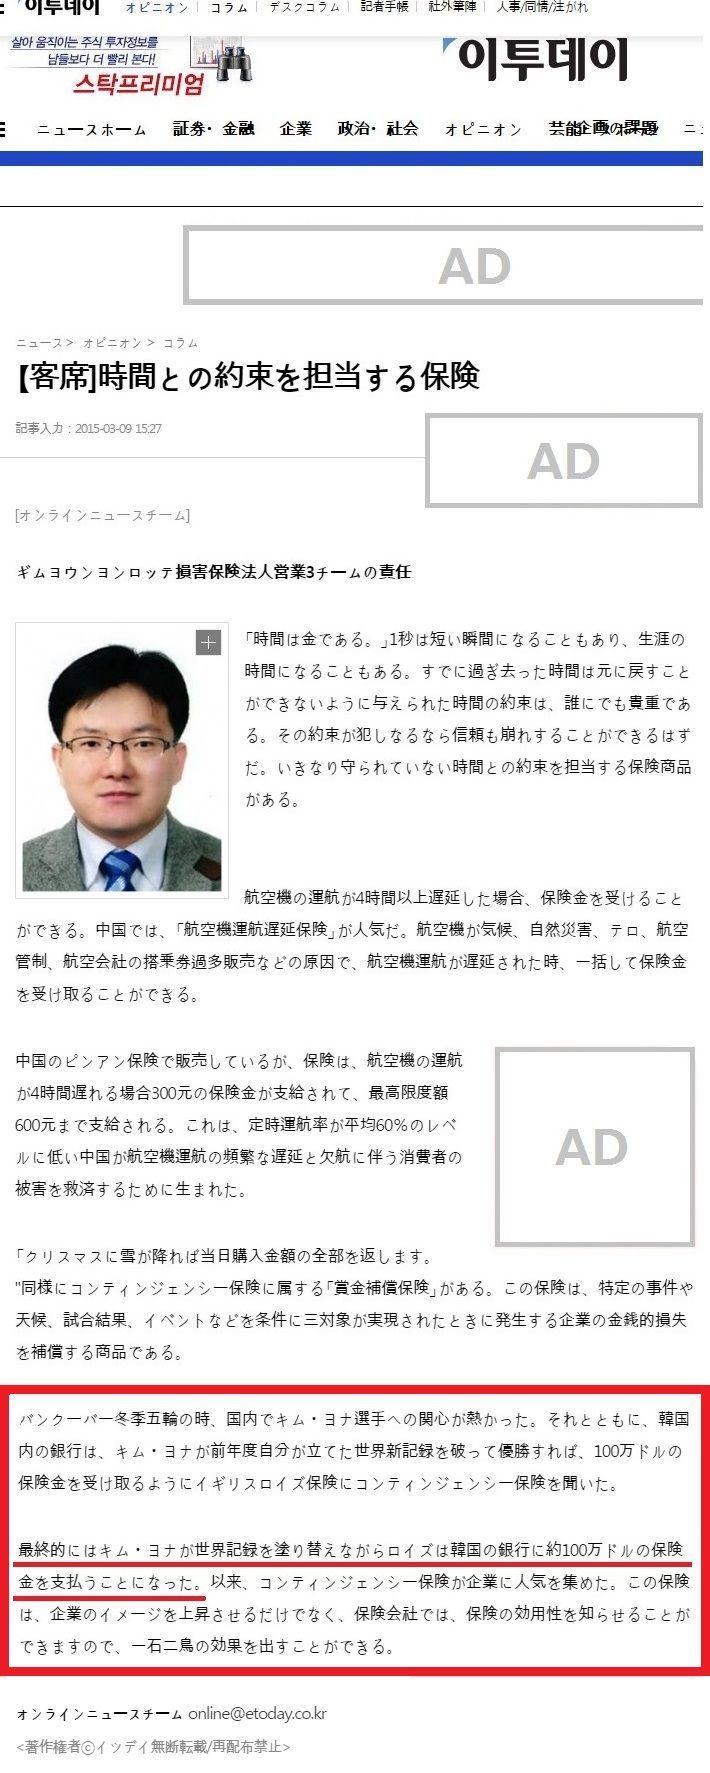 20150309etoday保険金受け取っていた日本語